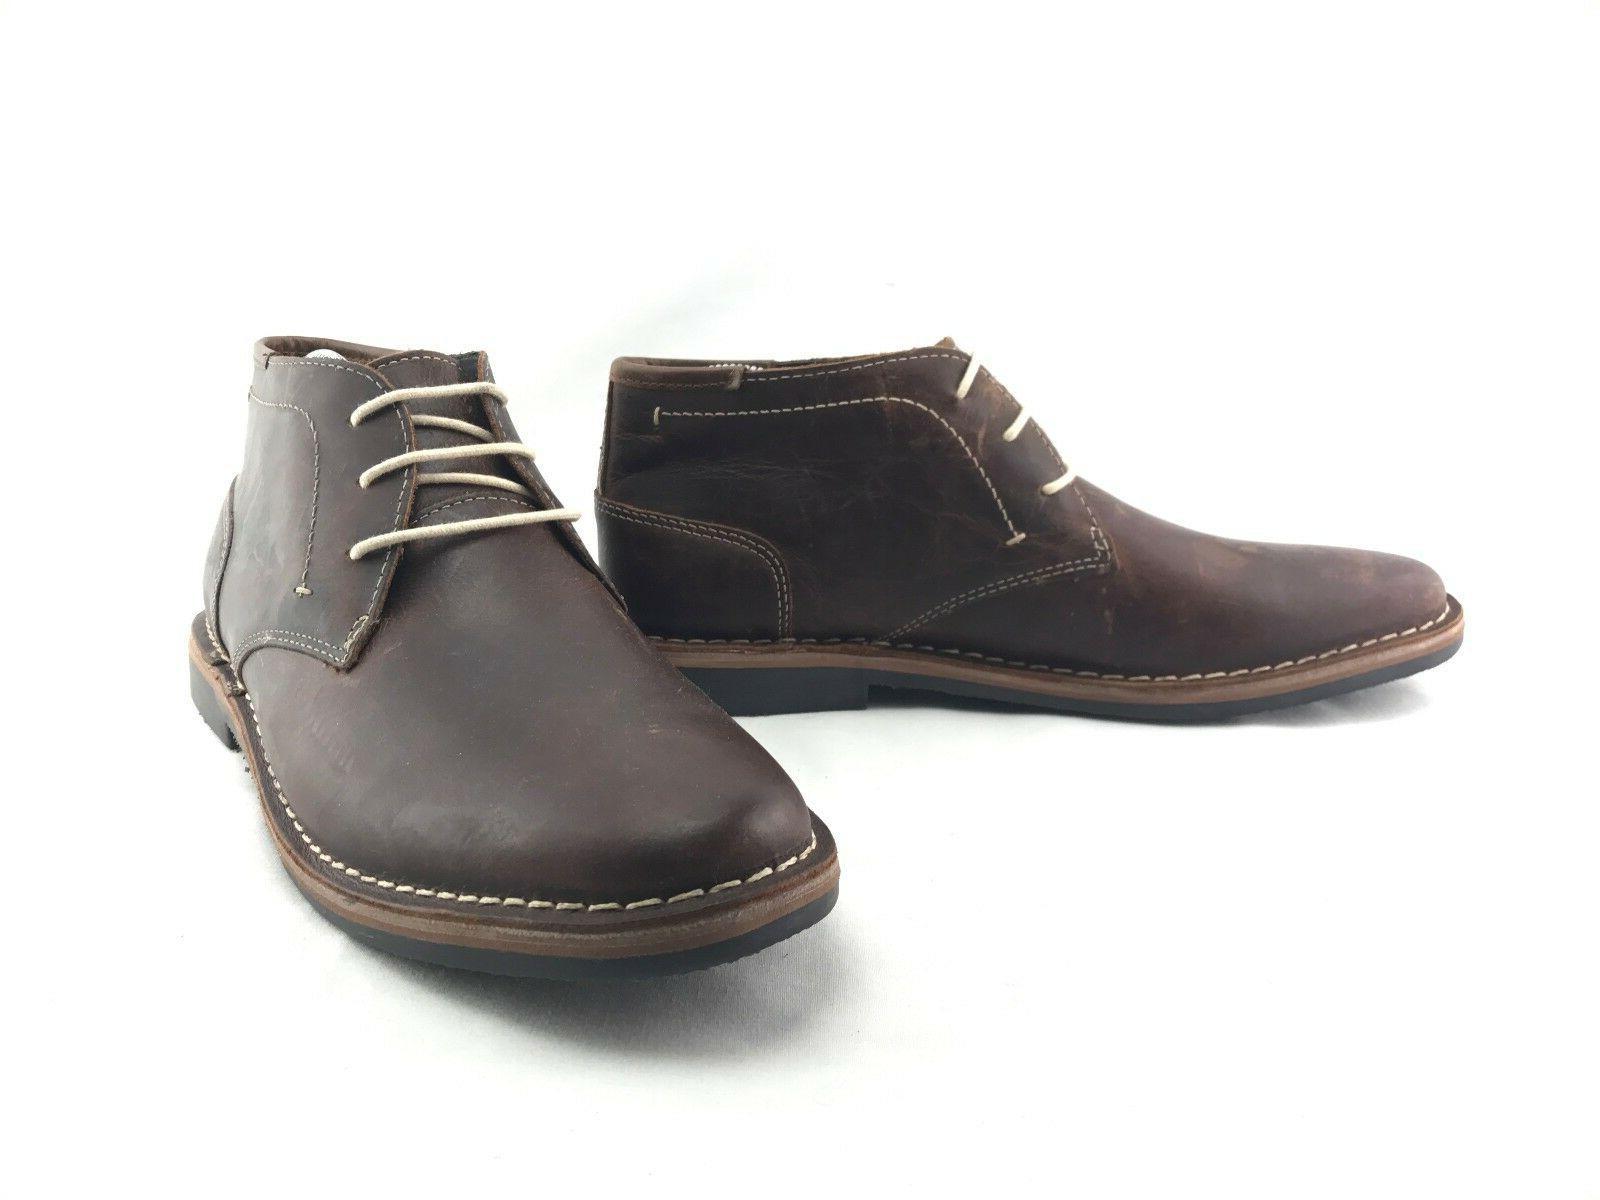 Steve Madden Hestonn Brown Leather Chukka US Shoes